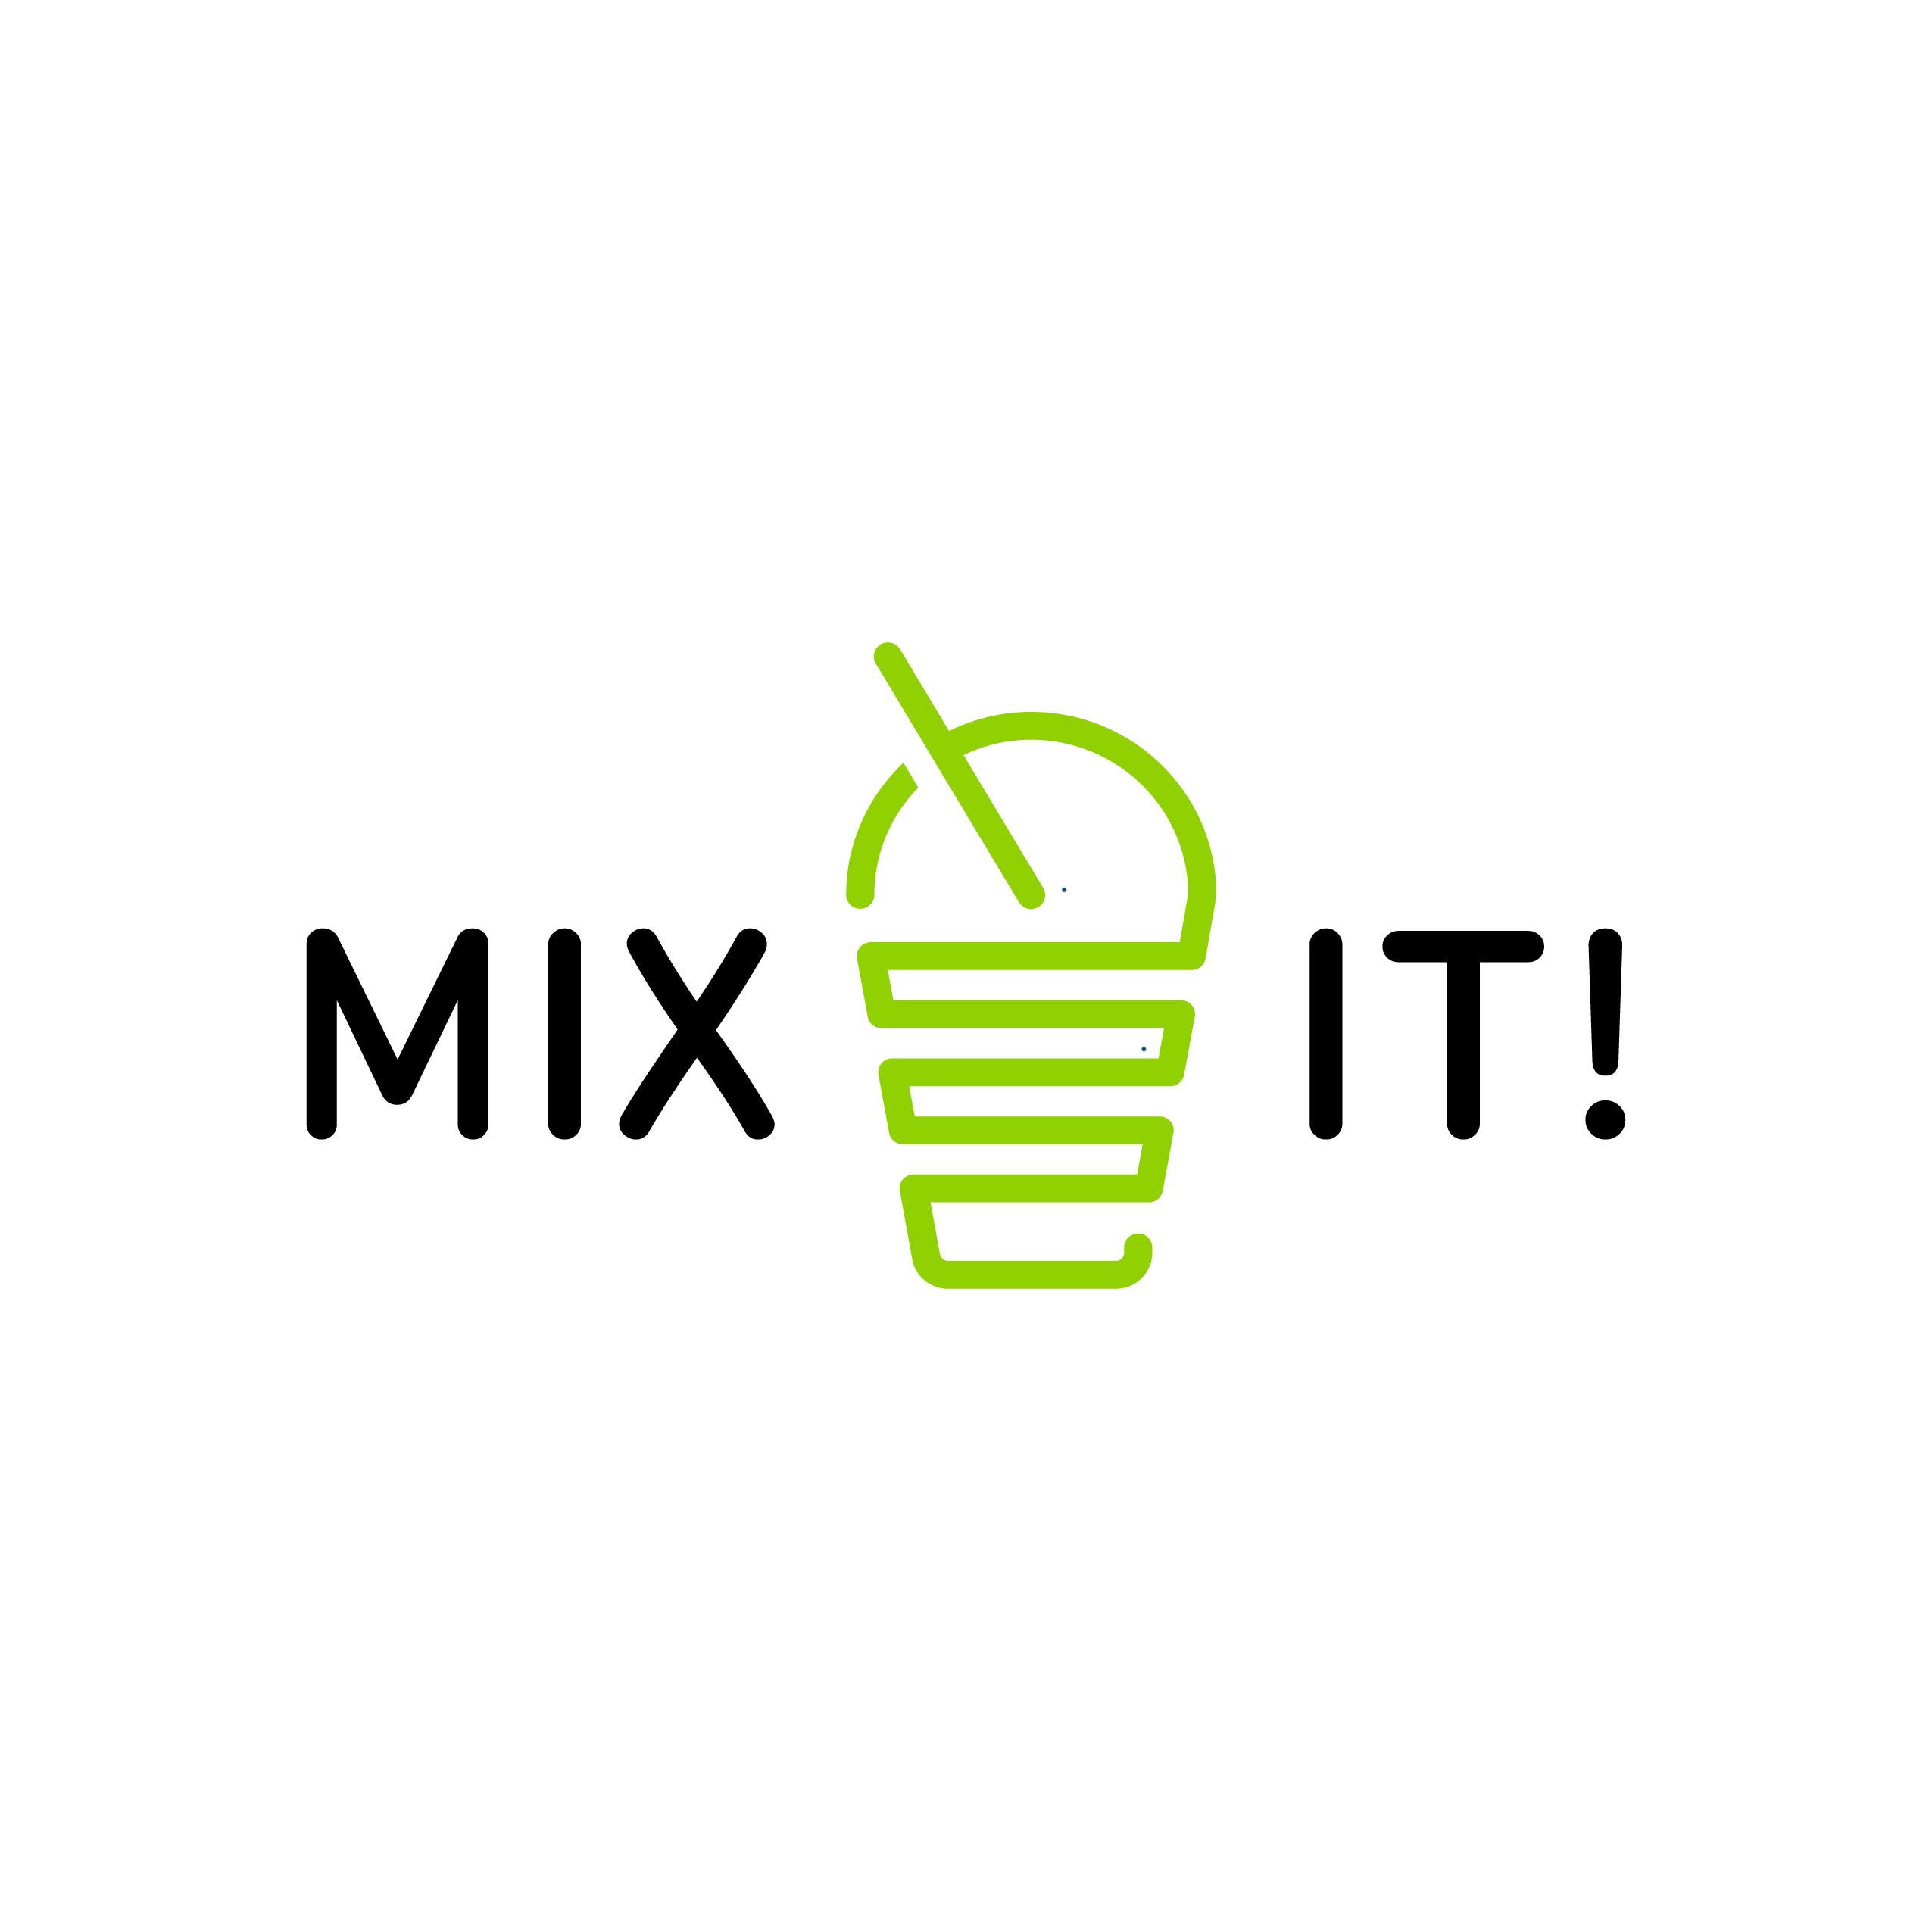 Mix-IT! logo design by logo designer Joris van Bussel